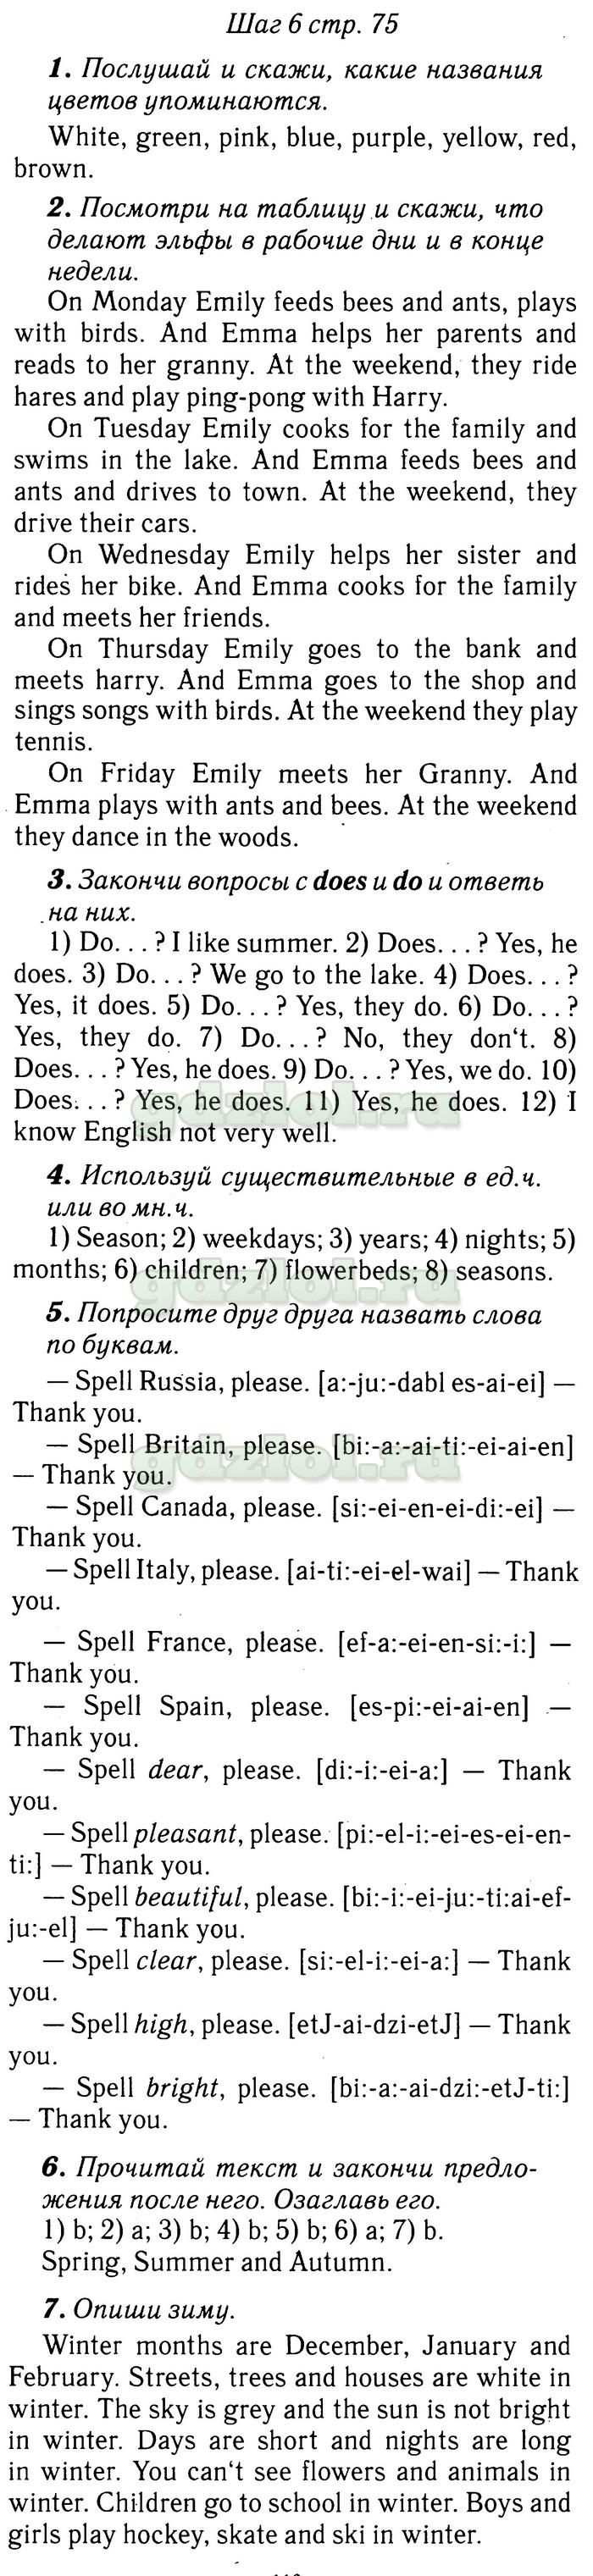 Перевод афанасьева 6 английский класс гдз